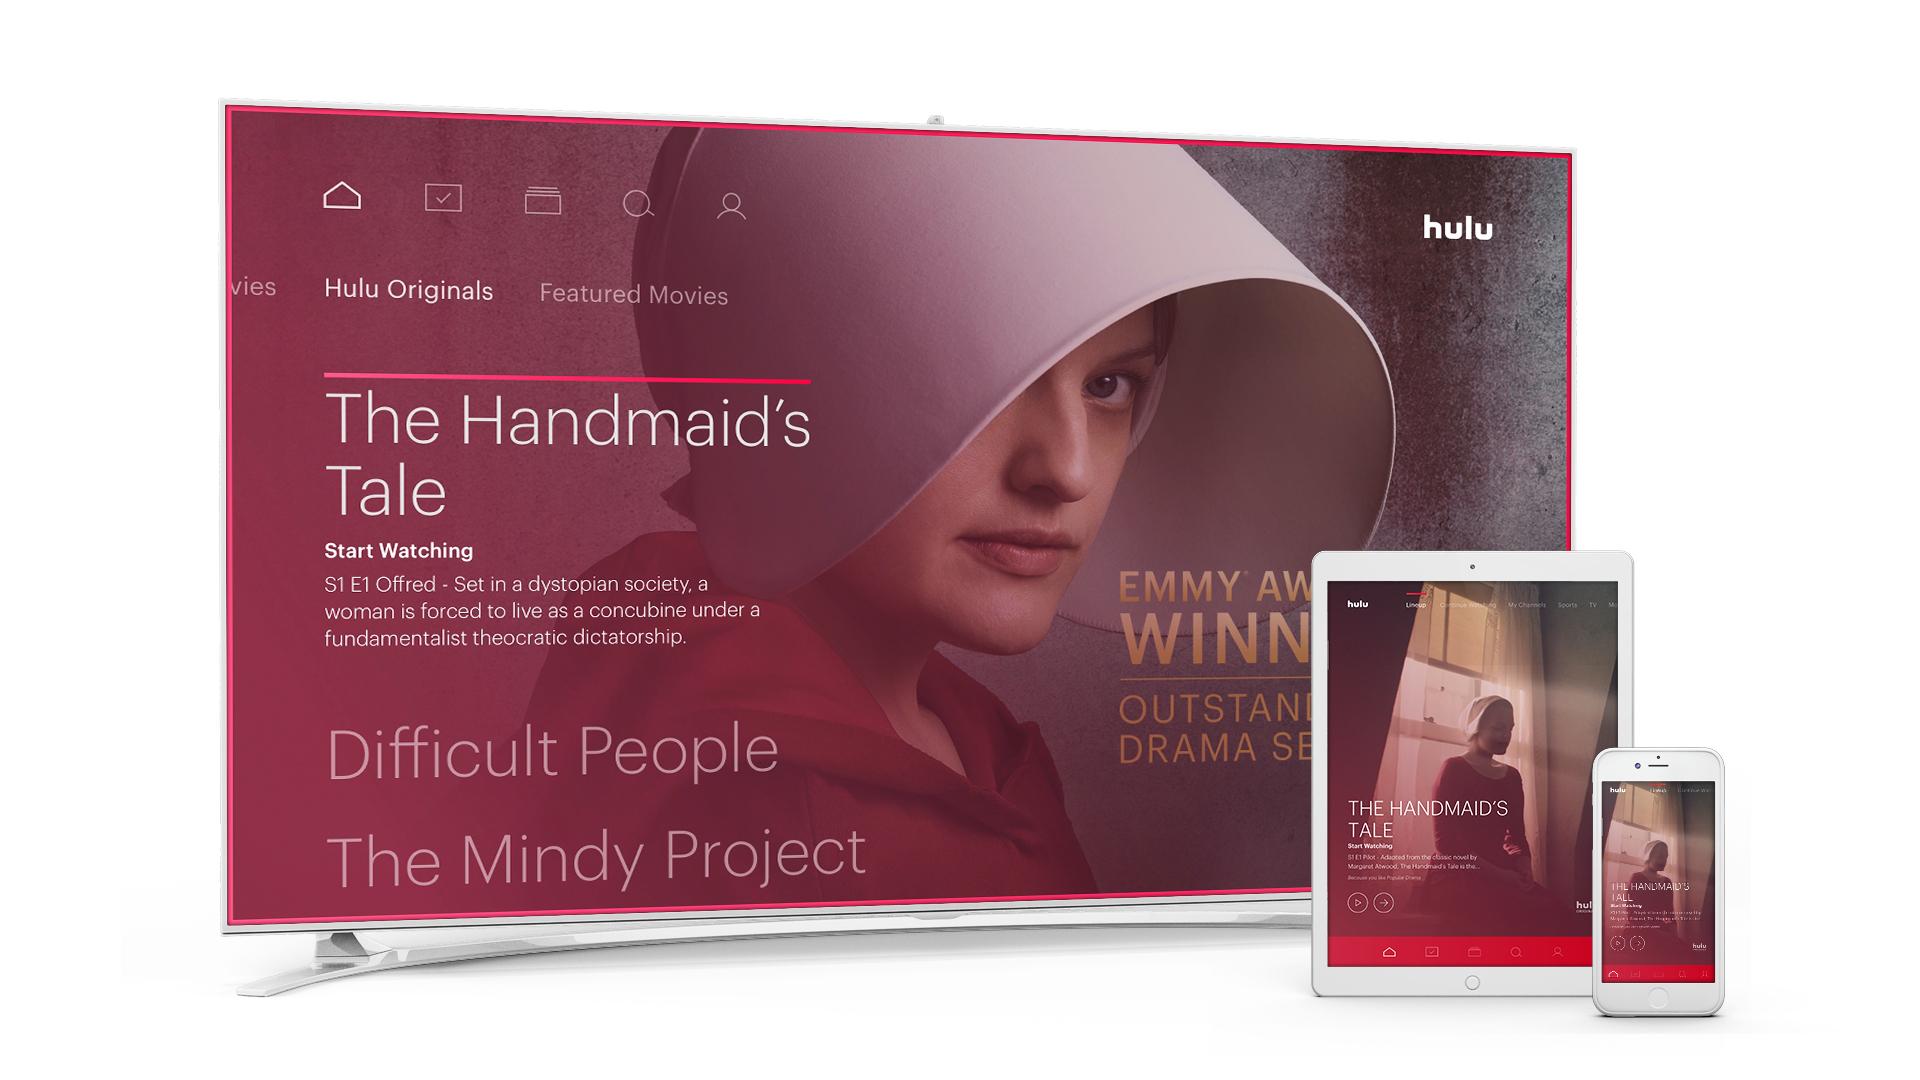 Hulu Handmaids Tale DeviceStacks-Lineup-sets